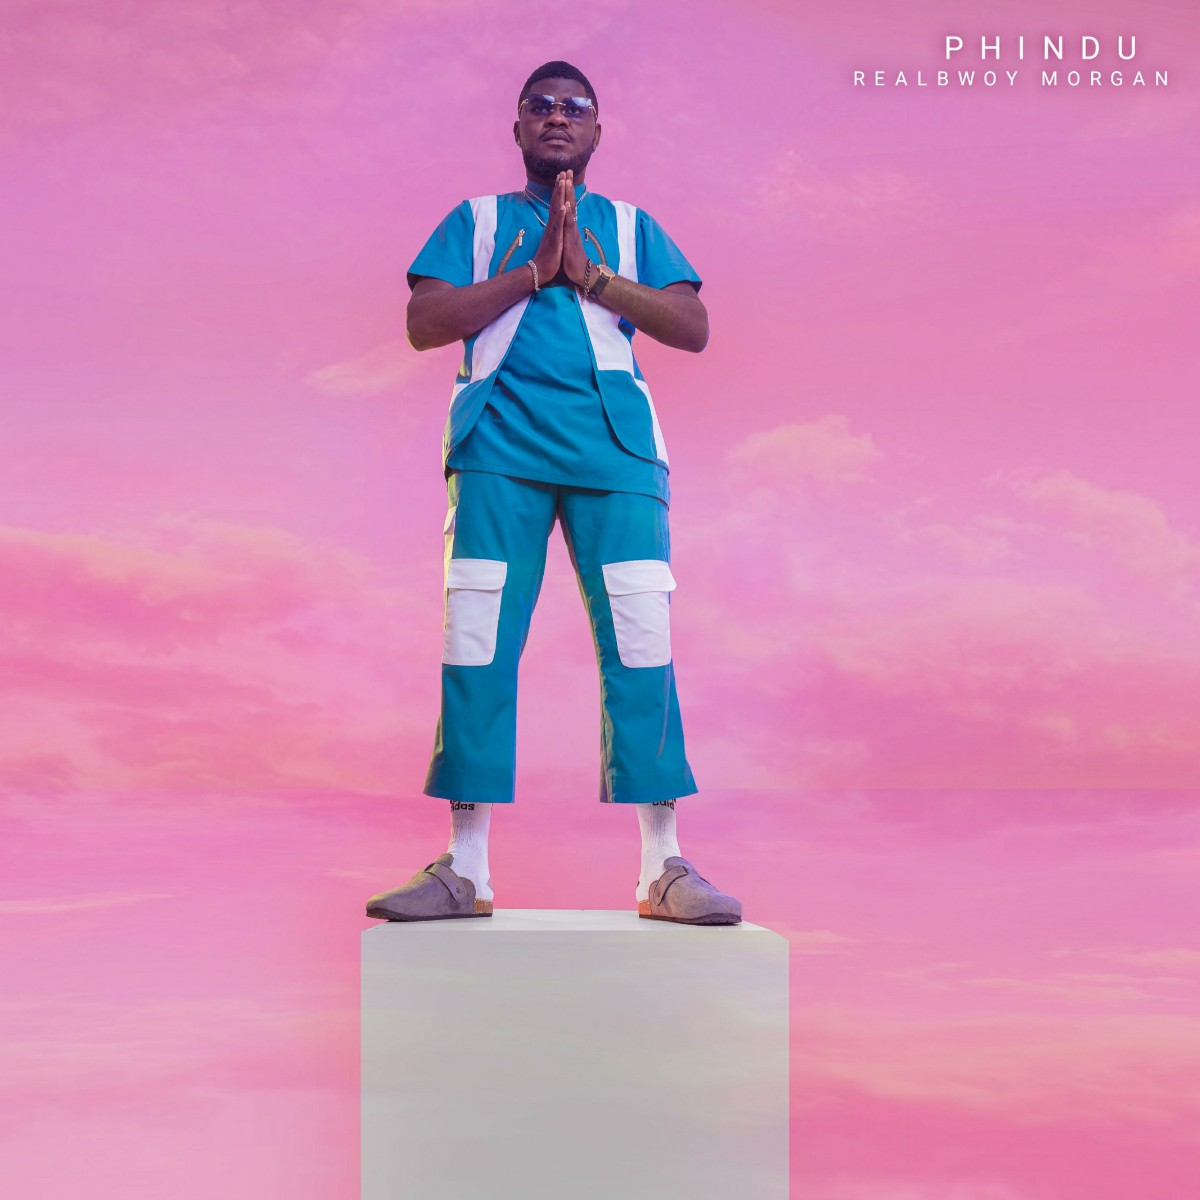 RealBwoy Morgan - Phindu (Prod. DJDro)